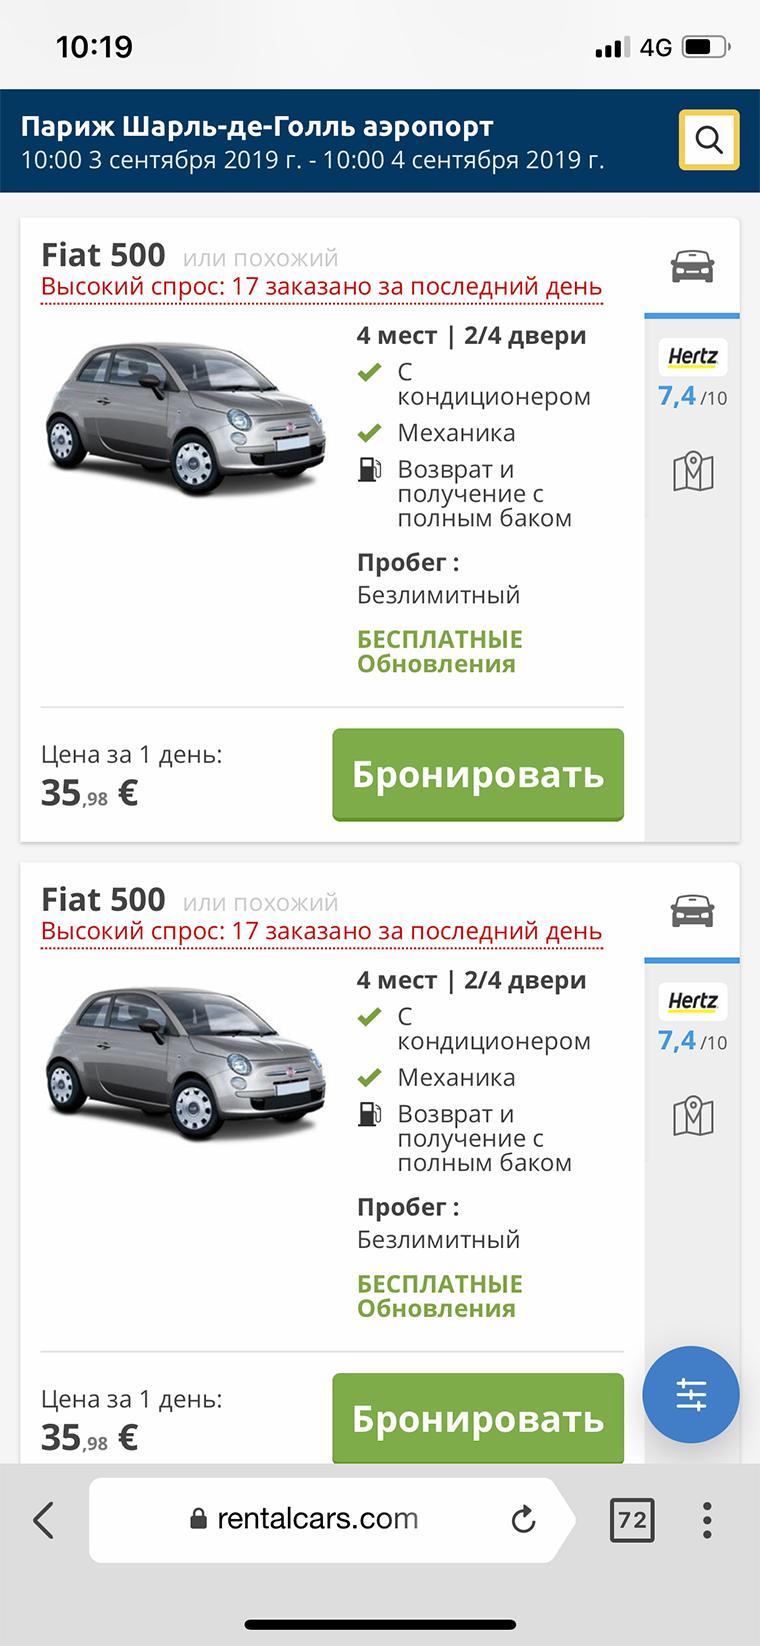 Цена аренды автомобиля в парижском аэропорту Шарль-де-Голль